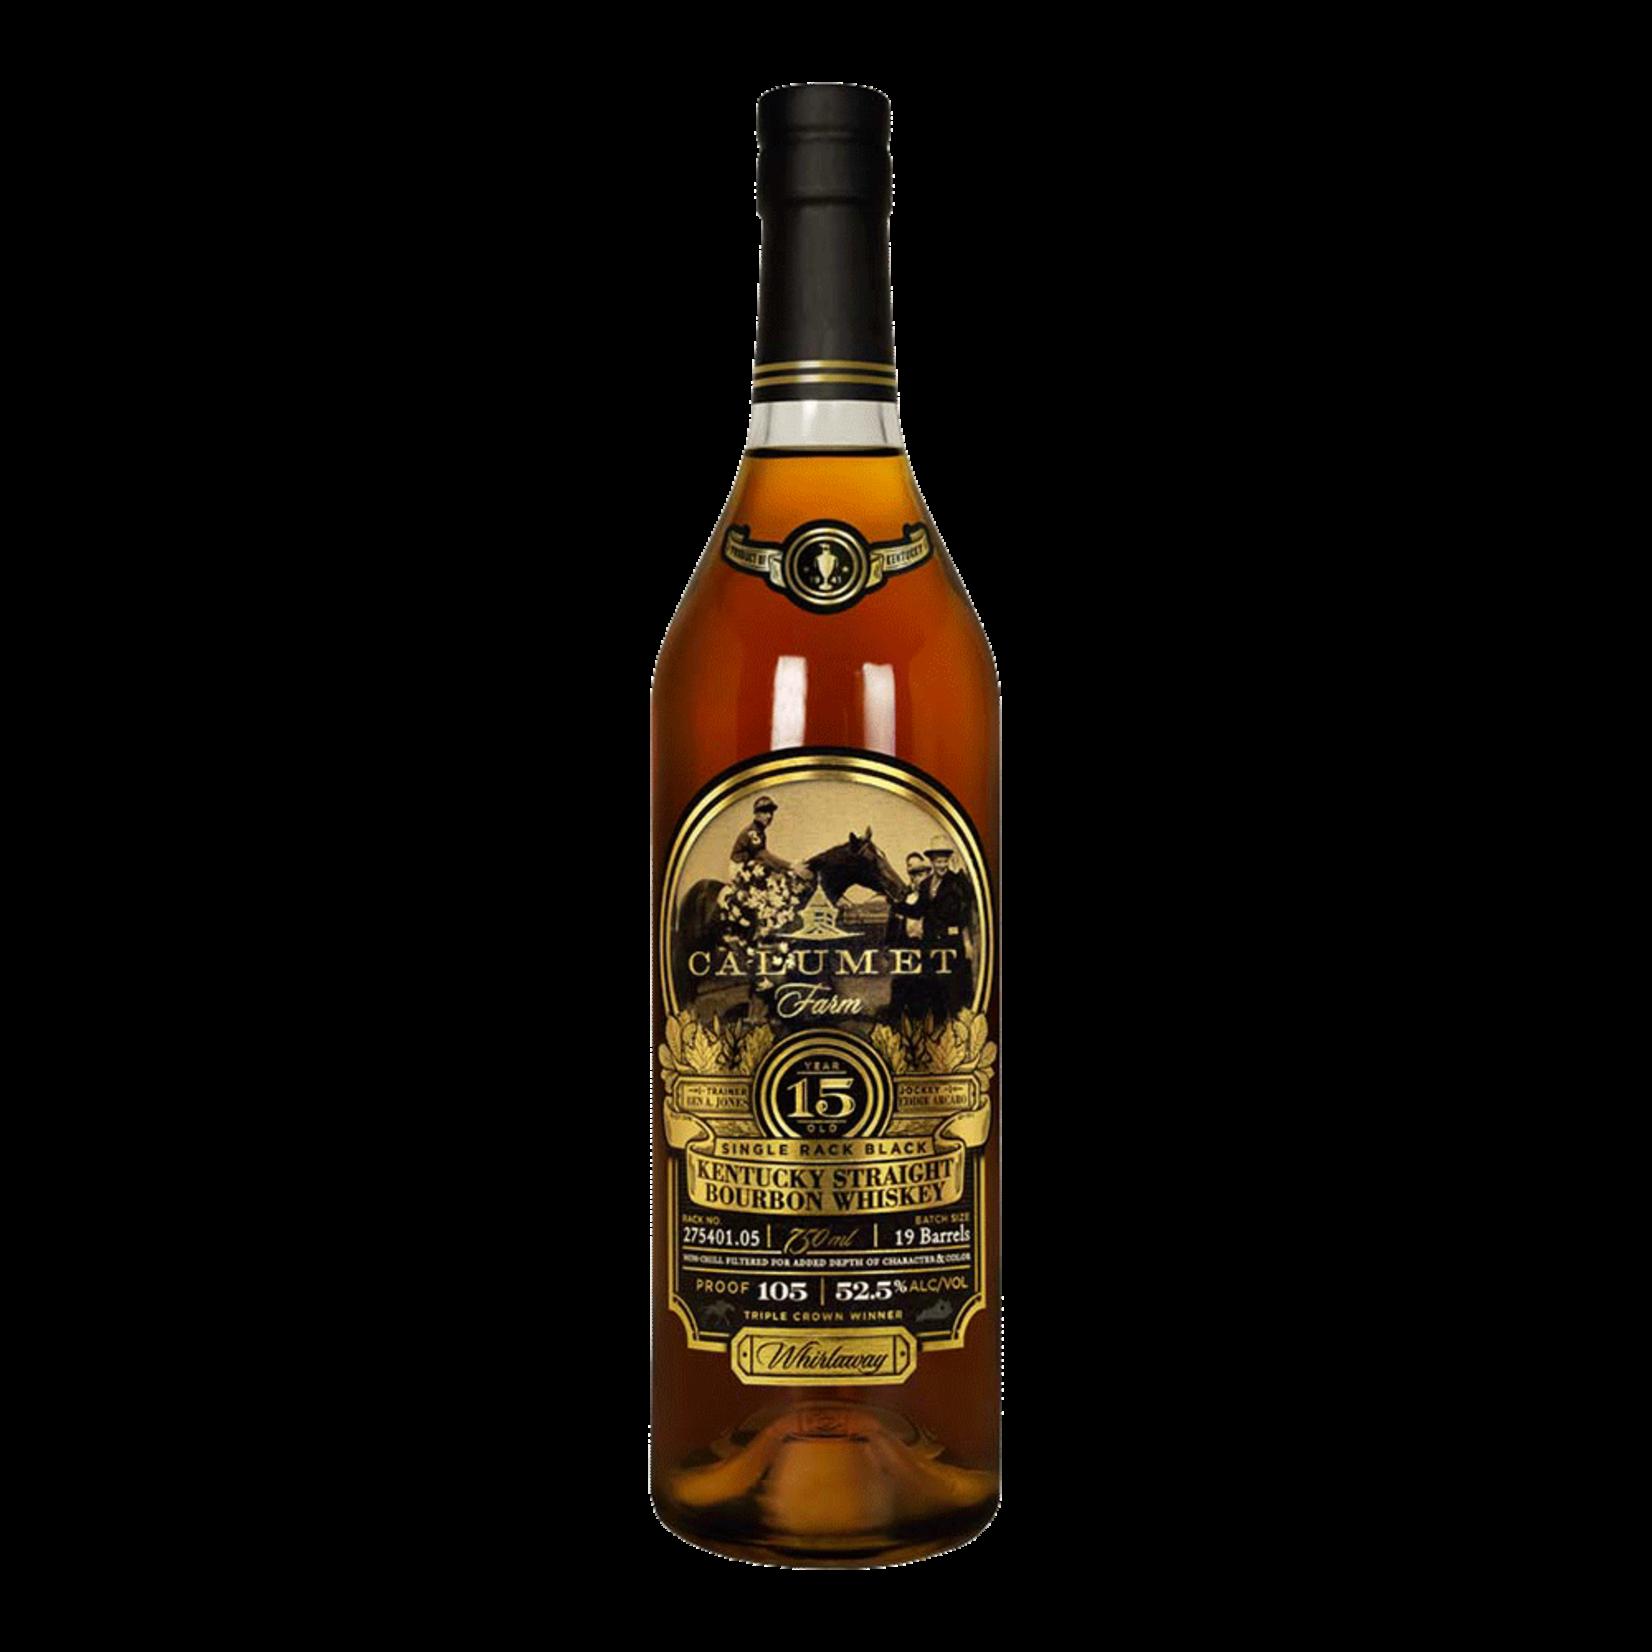 Spirits 105 Calumet 15 Year Bourbon